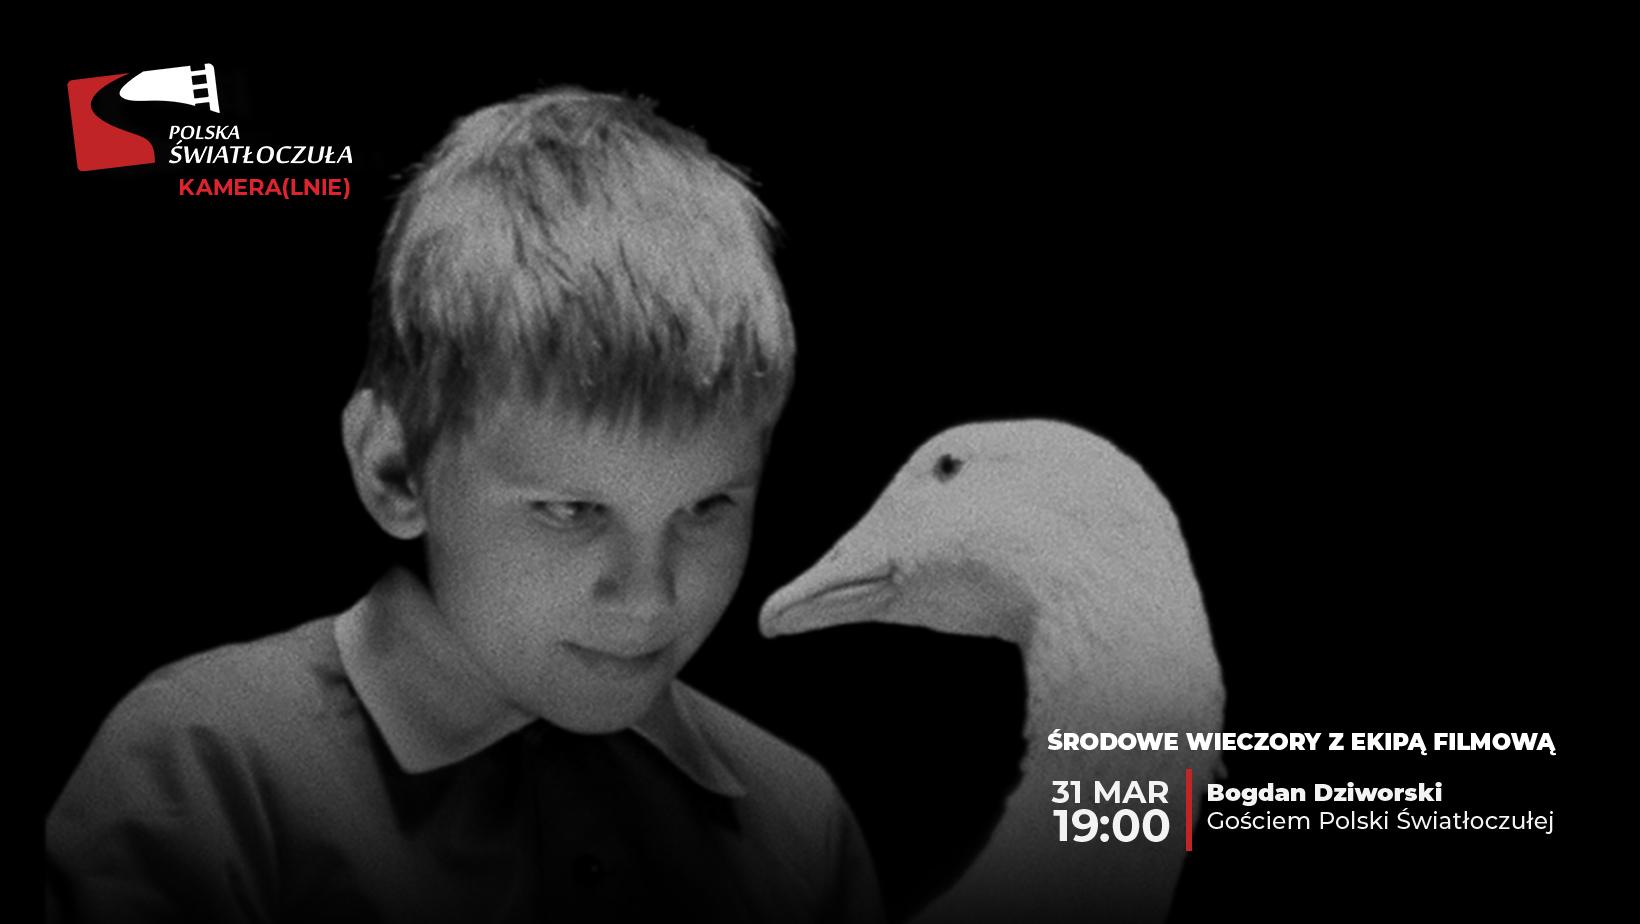 kameralnie BRAUN i DZIWORSKI facebook cover photo 3